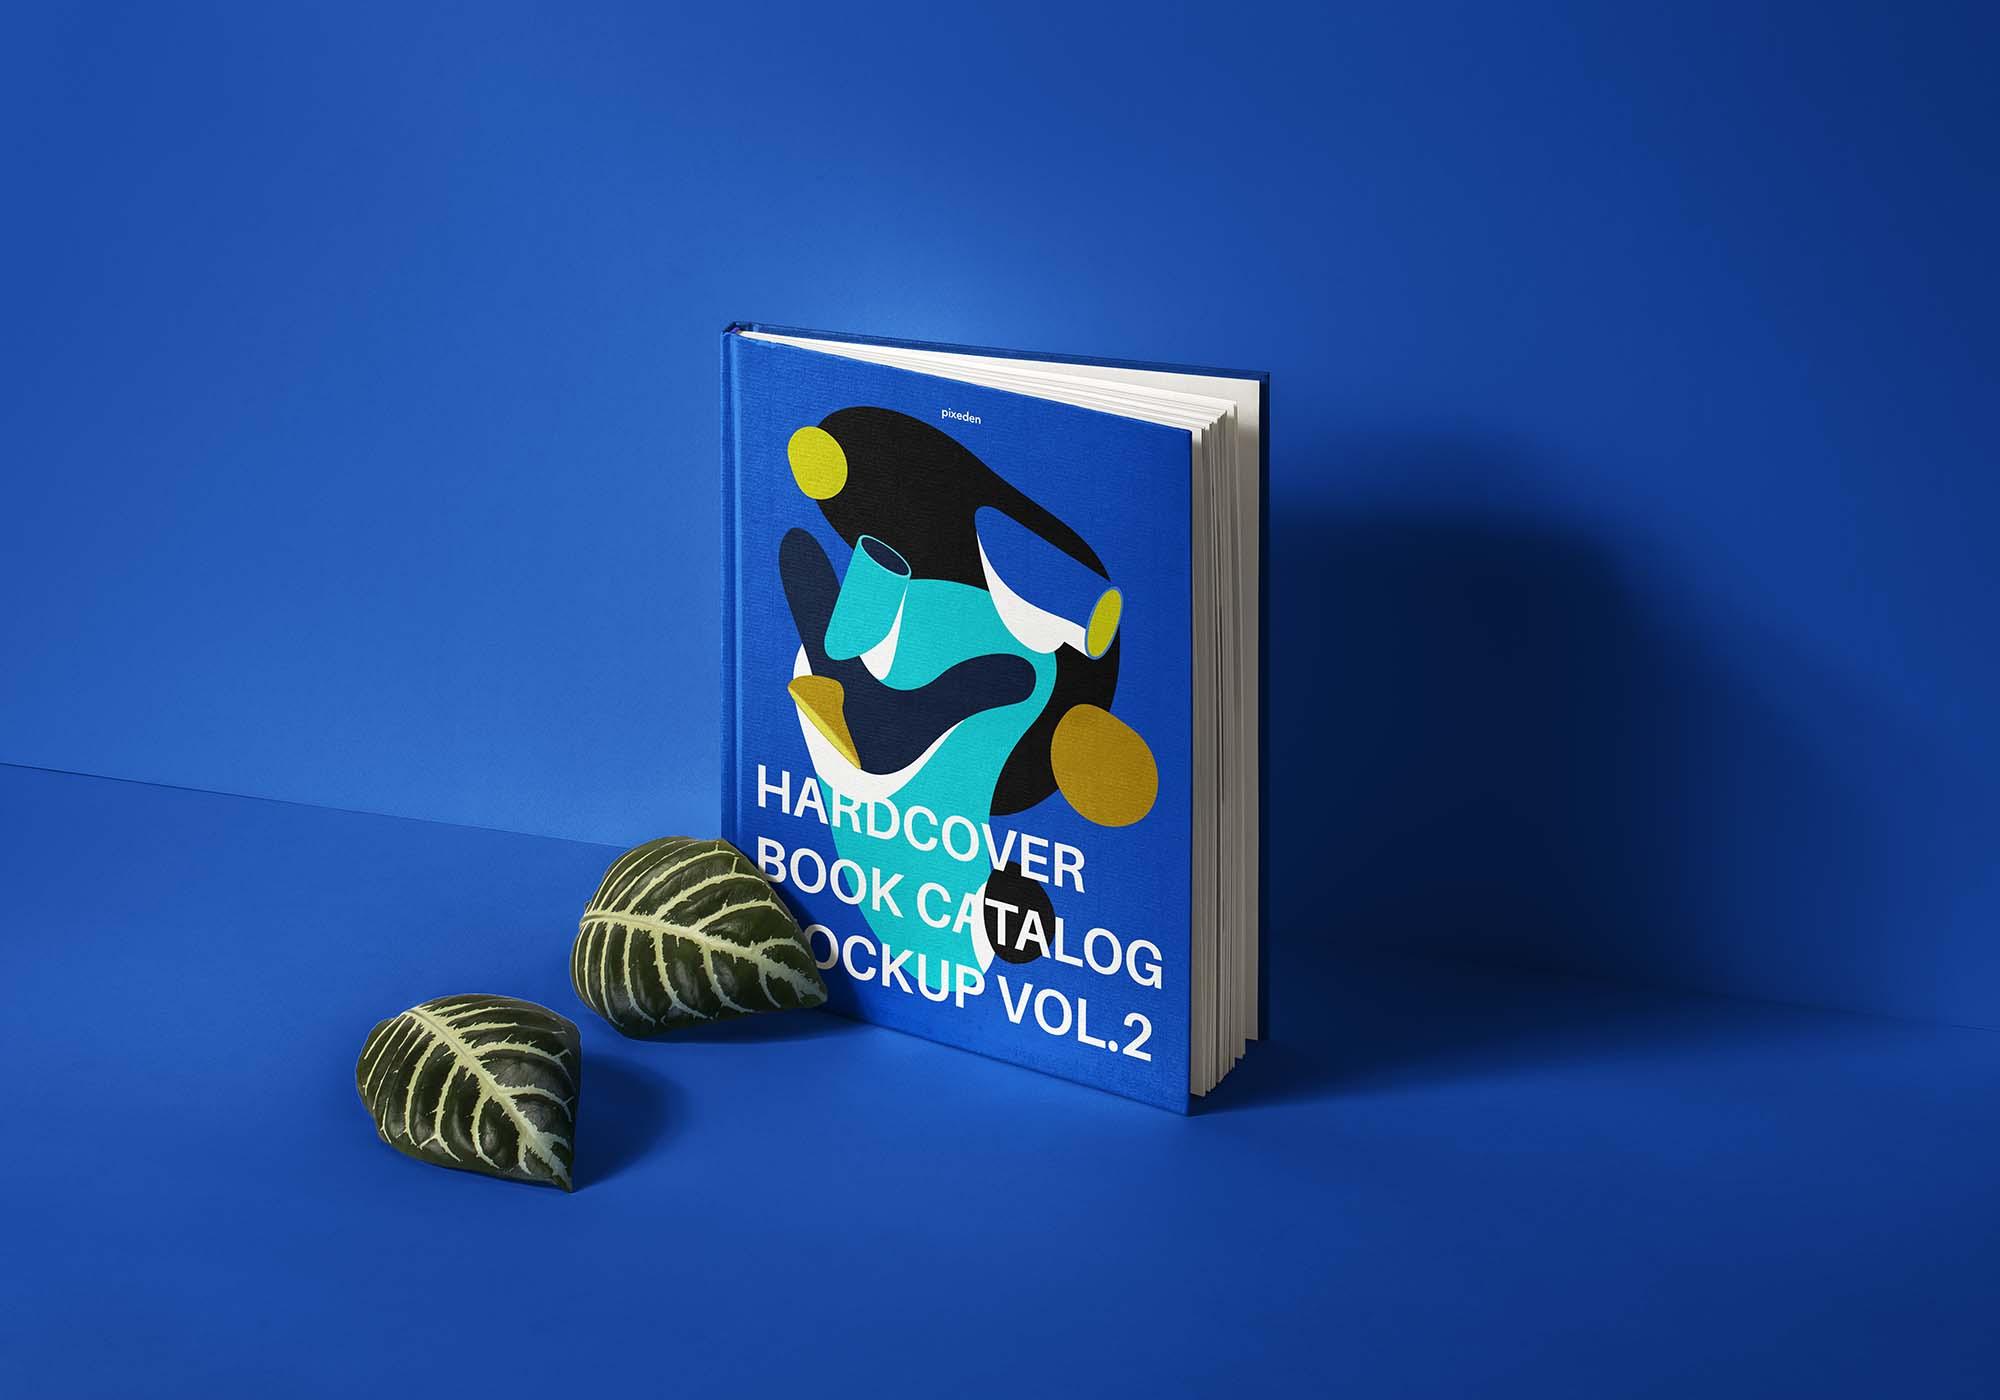 Hardcover Book Catalog Mockup 2